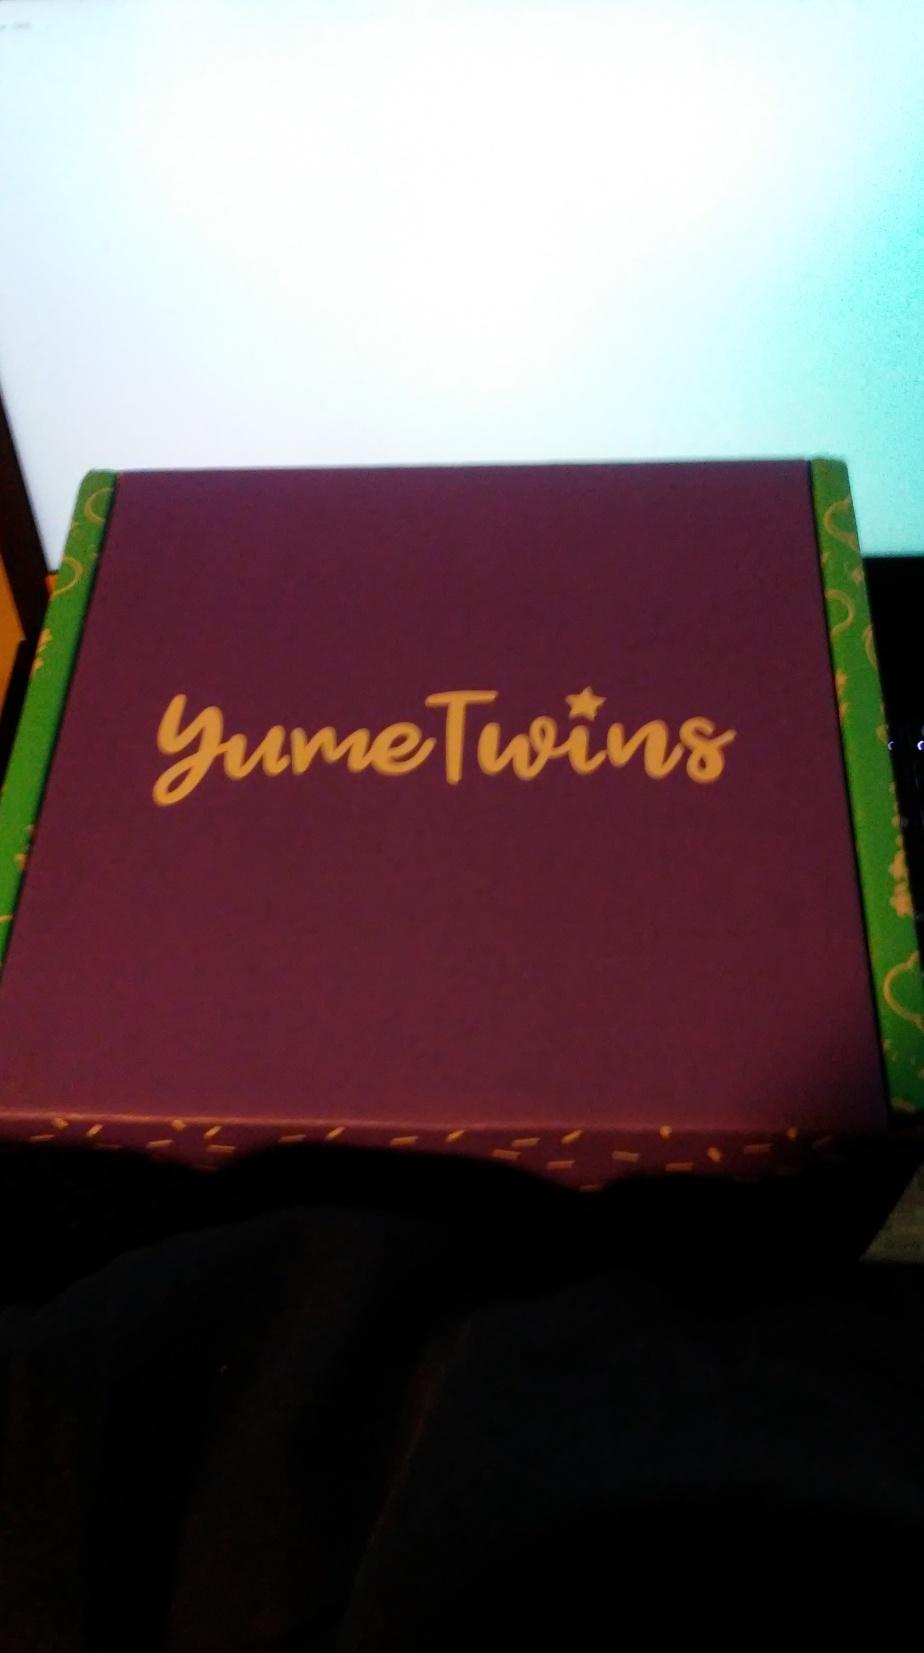 YumeTwins – November 2018 (TwinklingTransformation)